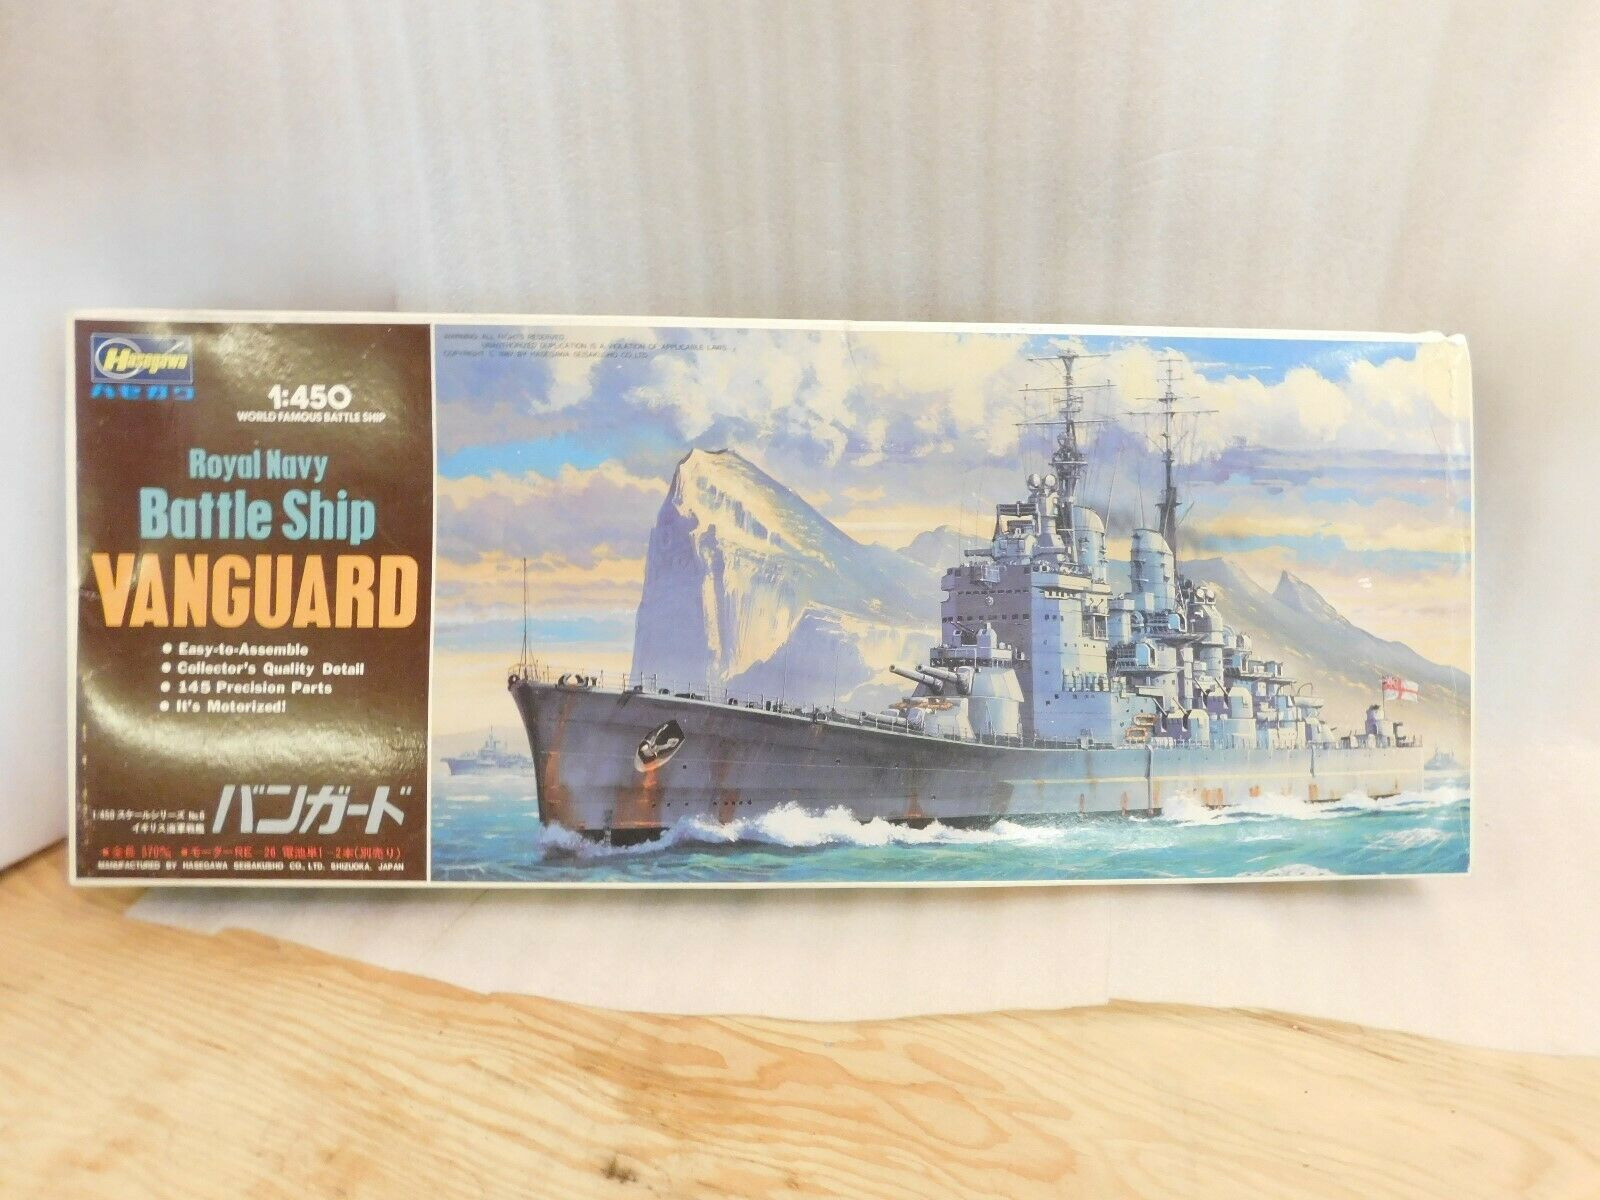 Hasegawa 1 450 Royal Navy Battle Ship Vanguard Plastic Model Kit